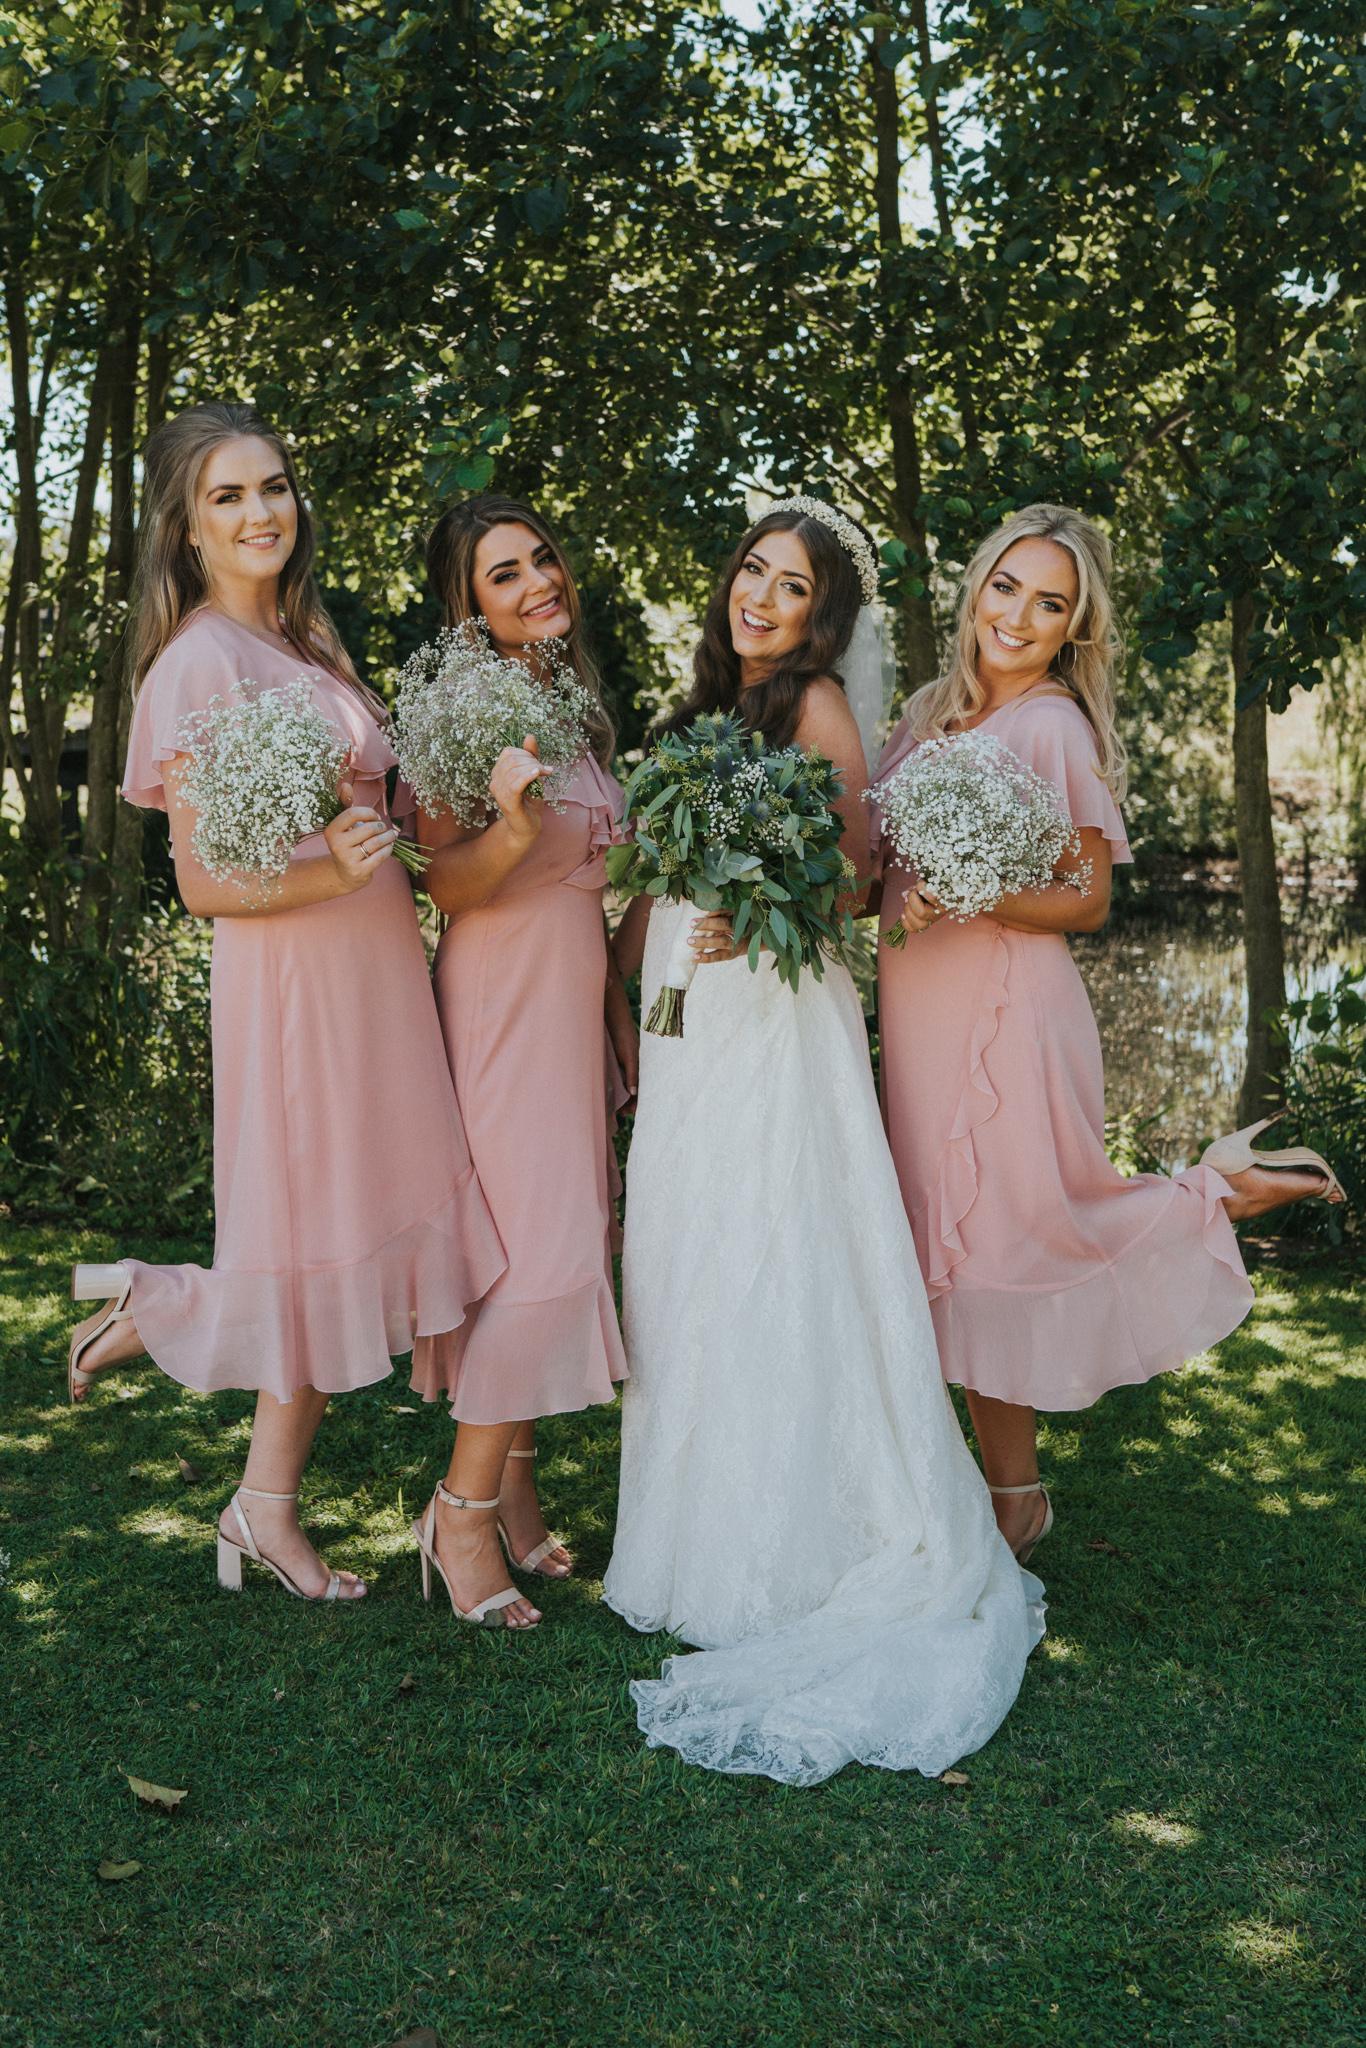 Sophie-Christian-Prested-Hall-Grace-Elizabeth-Previews-Essex-Norfolk-Suffolk-Devon-Alternative-Wedding-Photographer (12 of 20).jpg